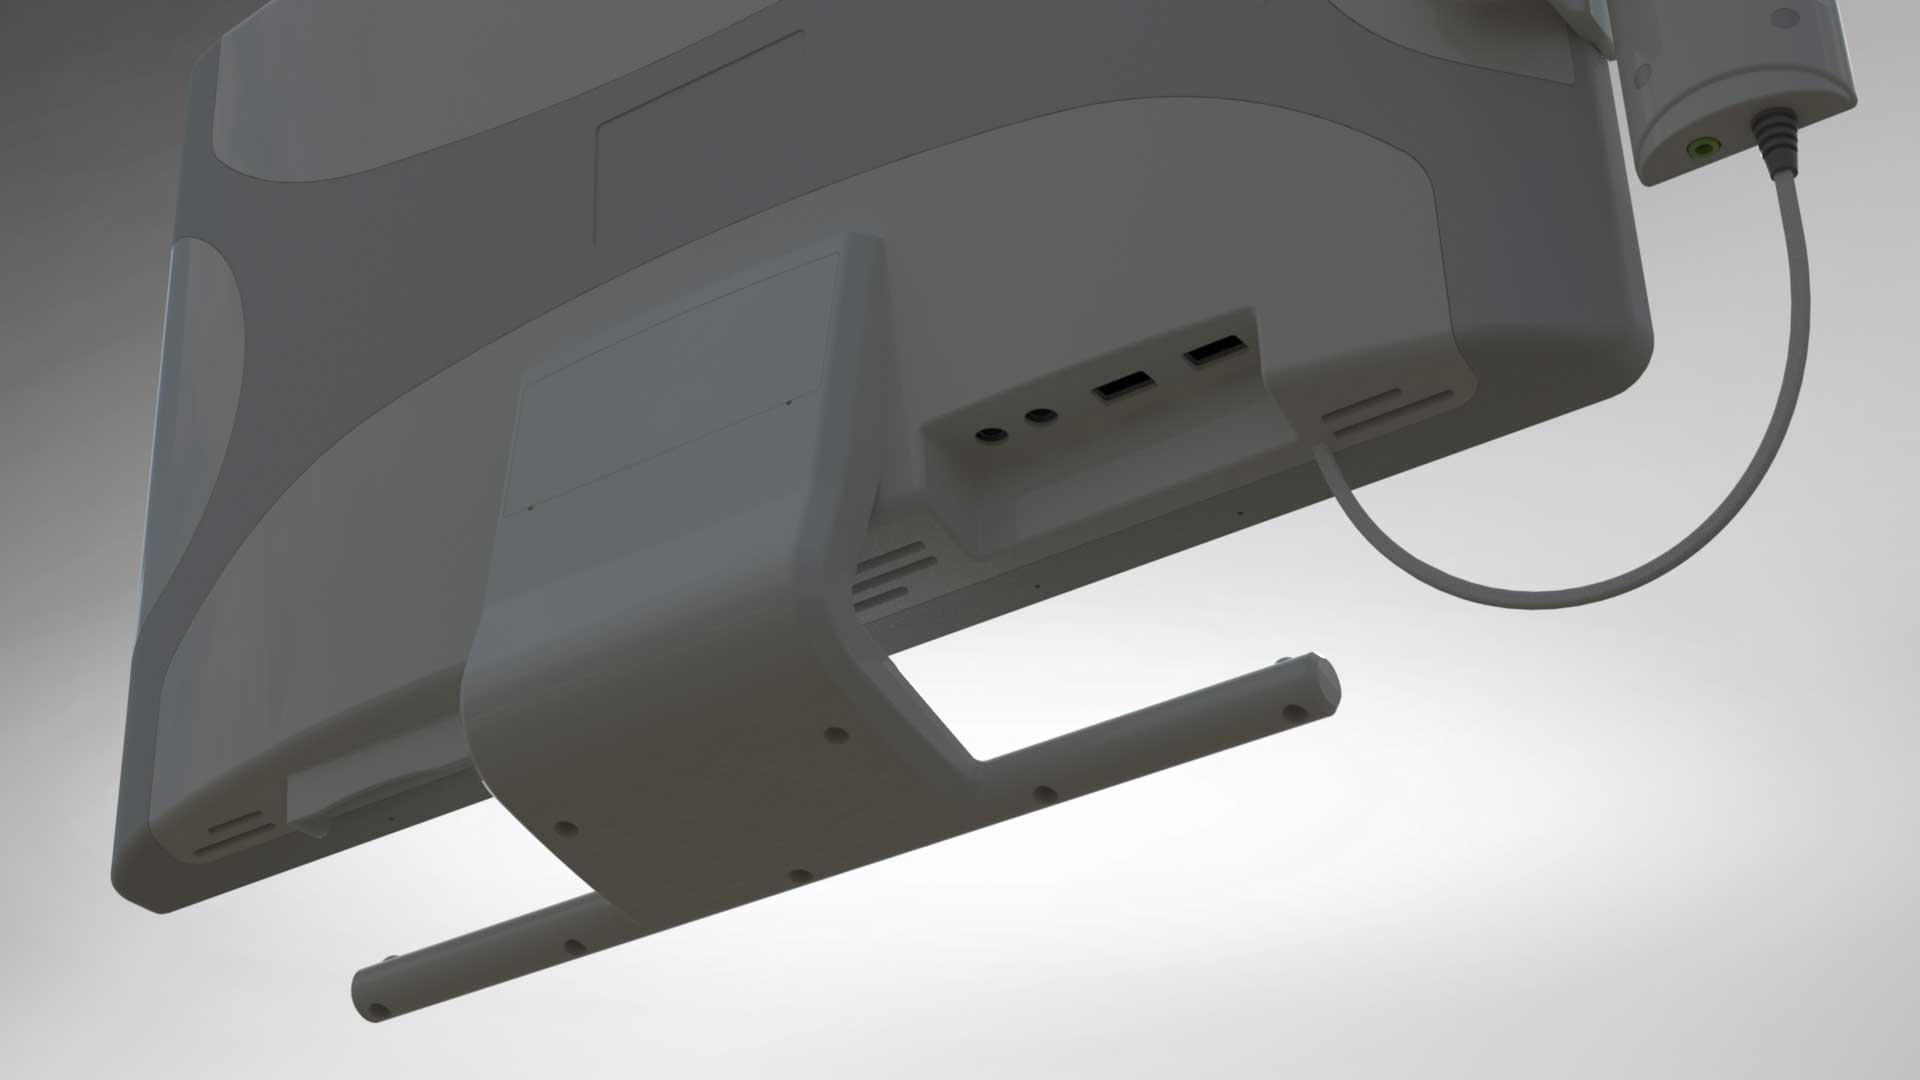 Display terminal rear